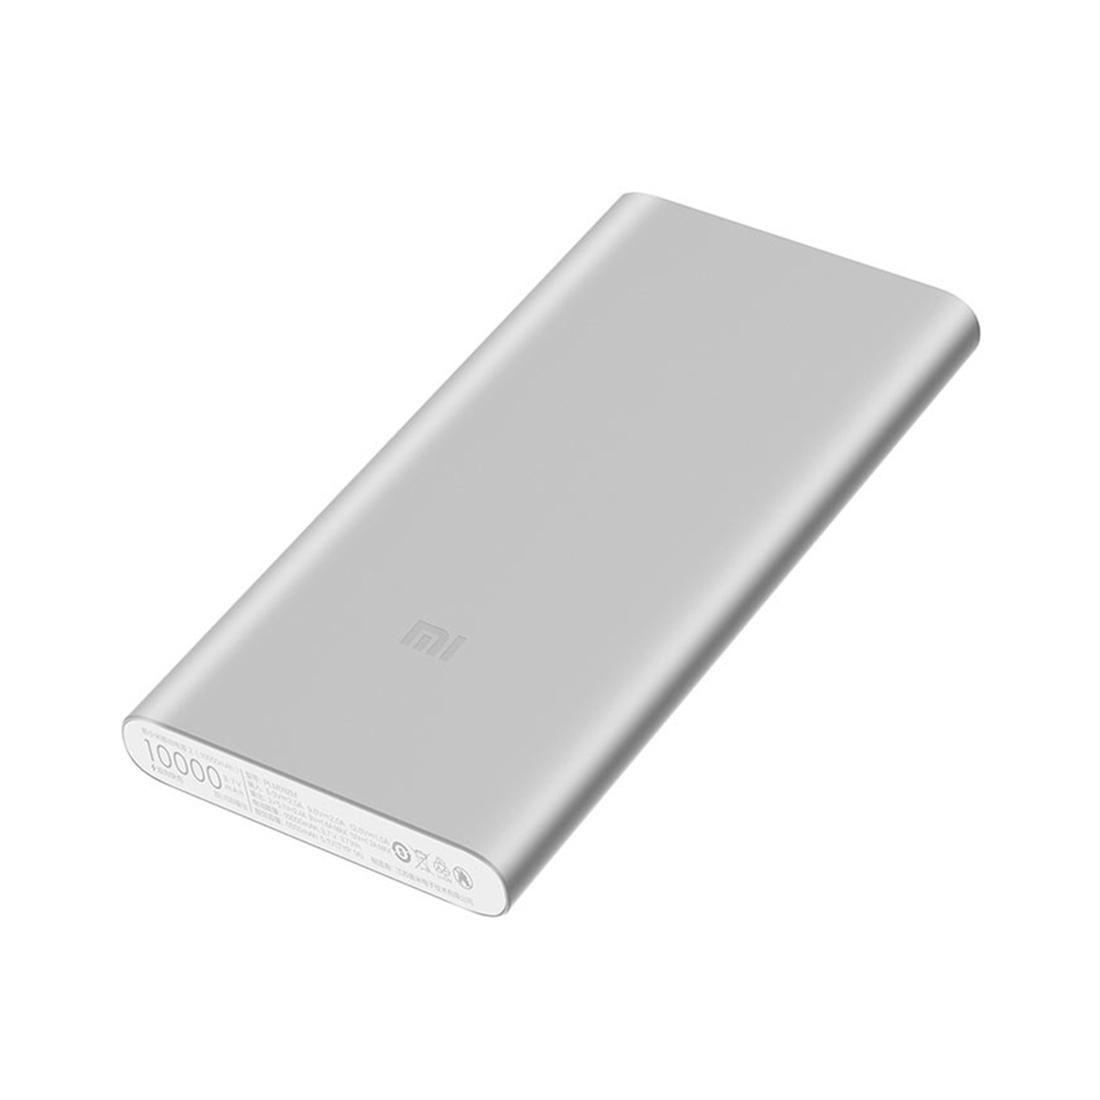 Портативное зарядное устройство Xiaomi Mi Power Bank 10000mAh 2S (2018 2-USB) Серебристый